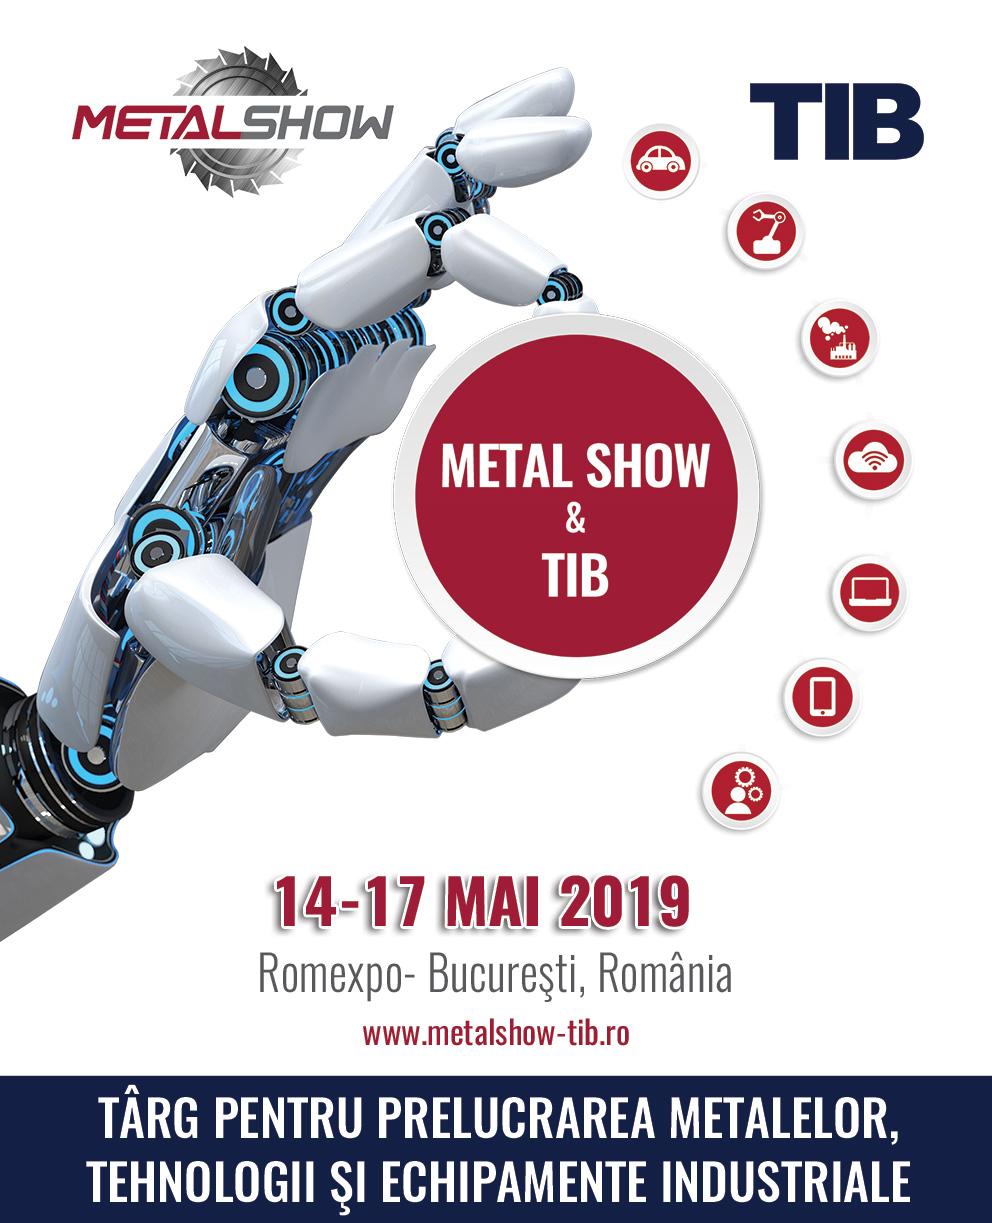 Începe METAL SHOW & TIB la Romexpo